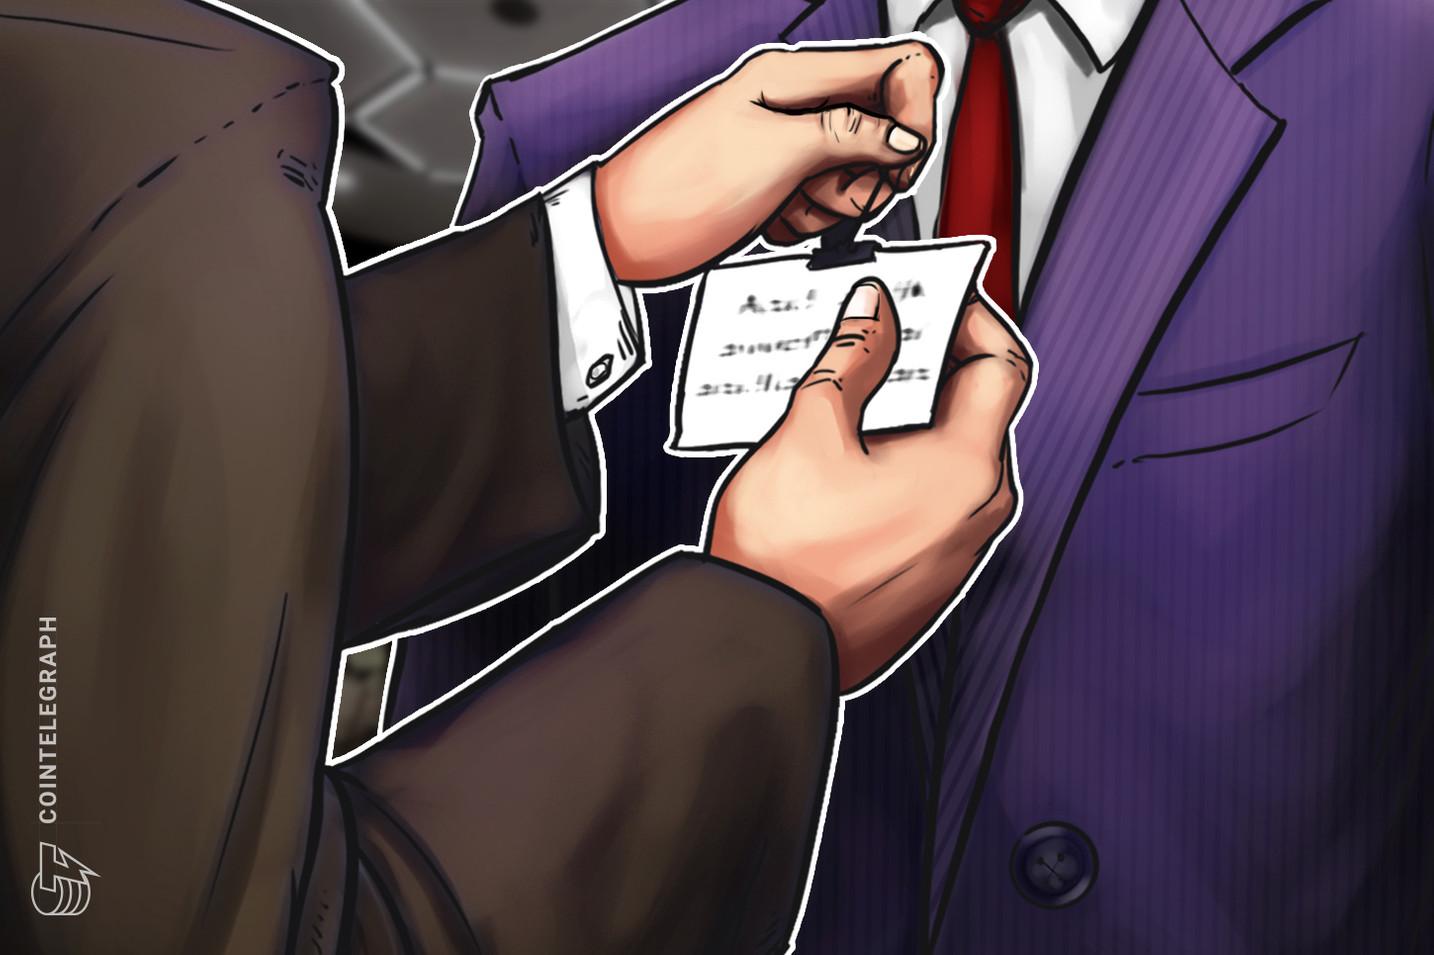 Dan Loeb contrata analista pró-criptomoedas da Goldman Sachs para seu fundo de hedge